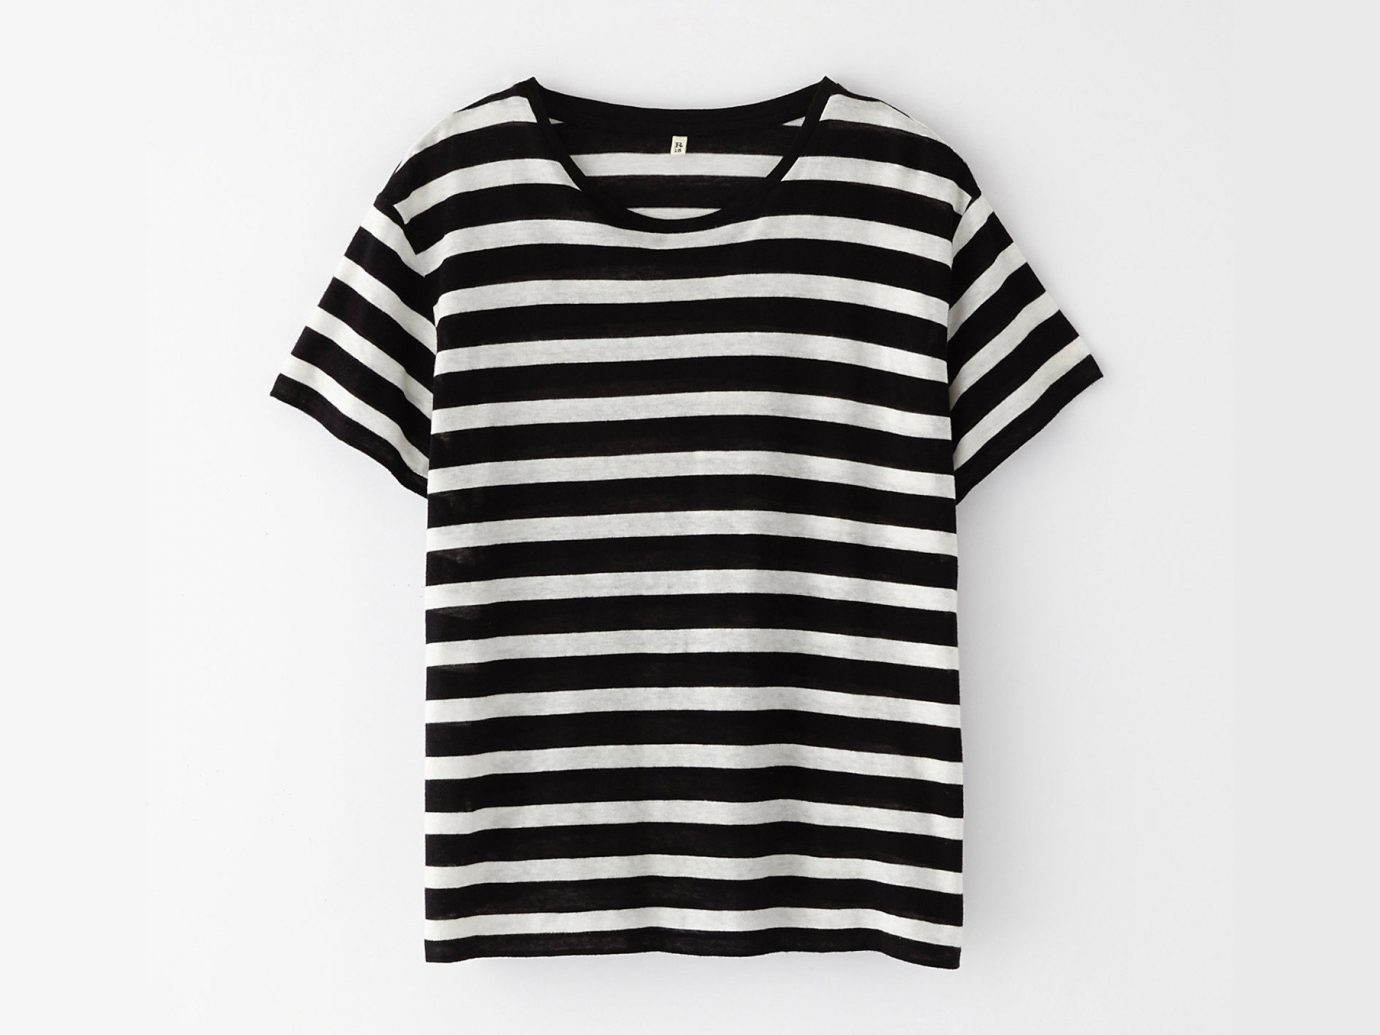 Style + Design black clothing white sleeve t shirt product long sleeved t shirt pocket brand neck active shirt collar